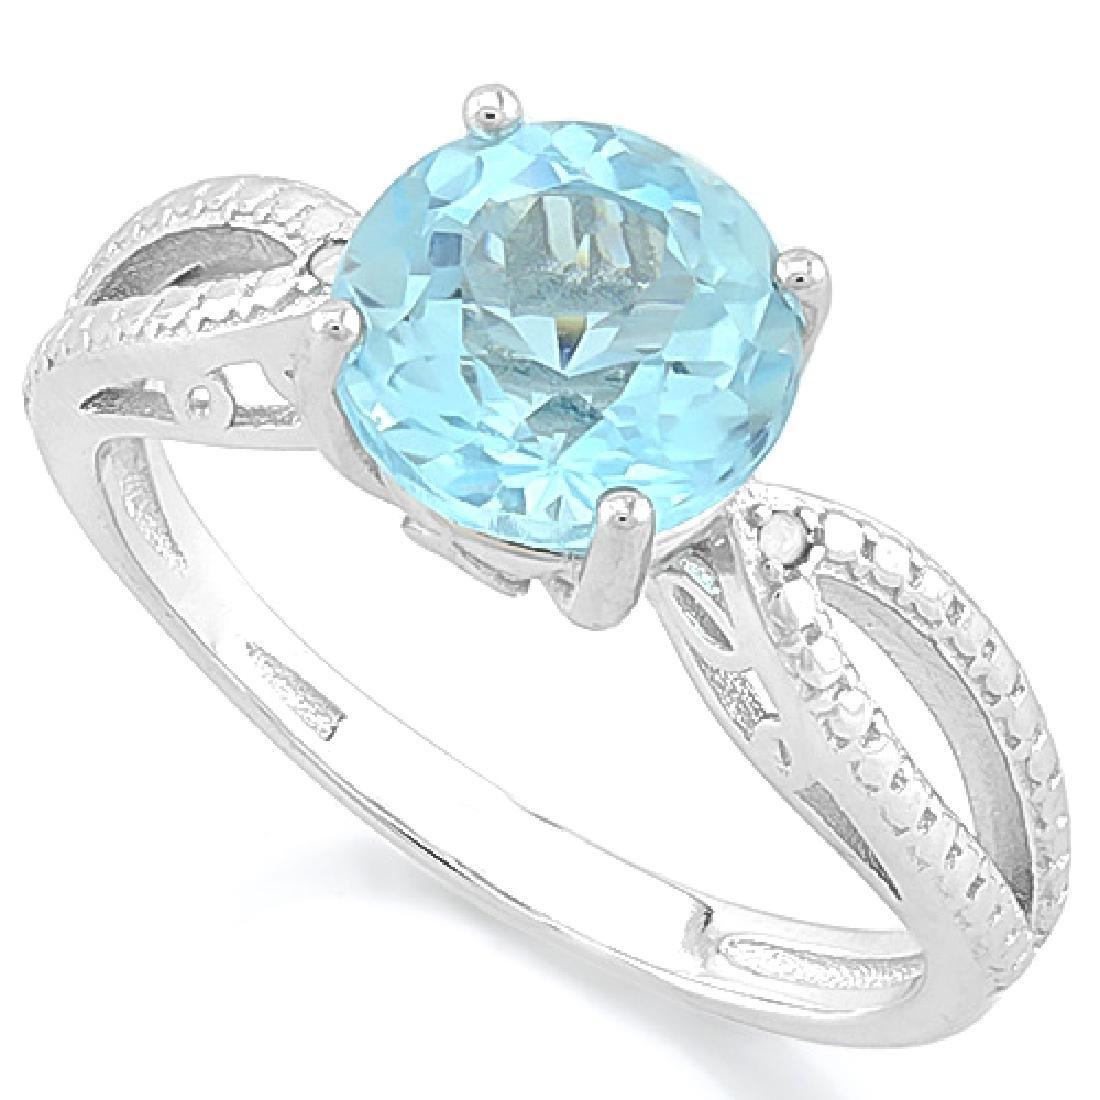 2 1/2 CARAT BABY SWISS BLUE TOPAZ & DIAMOND 925 STERLIN